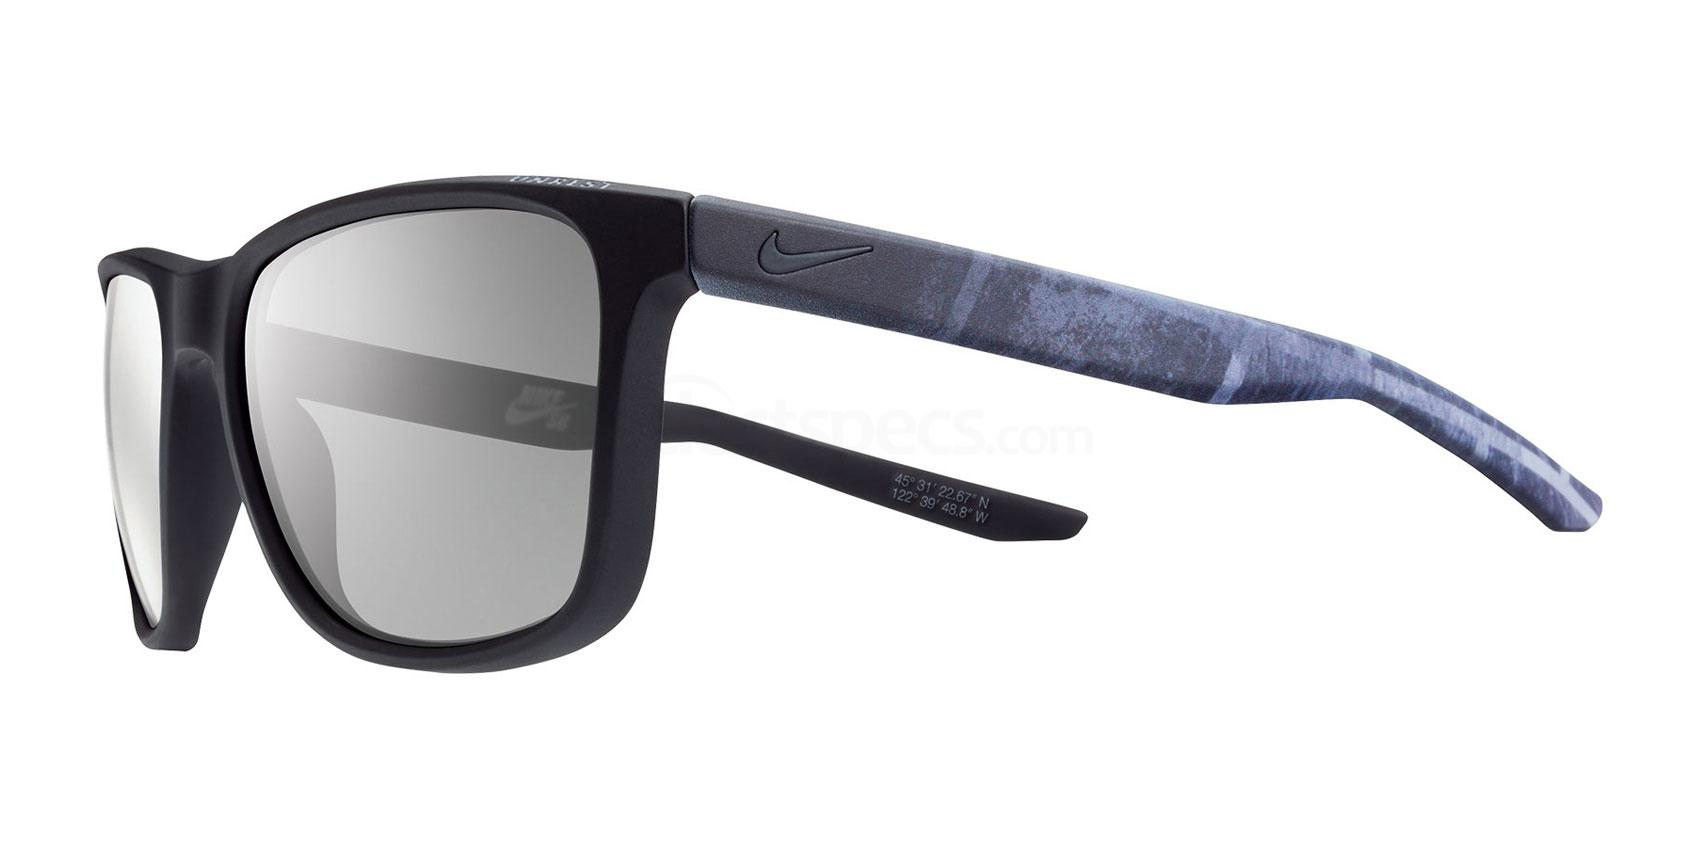 002 UNREST EV0922 SE Sunglasses, Nike